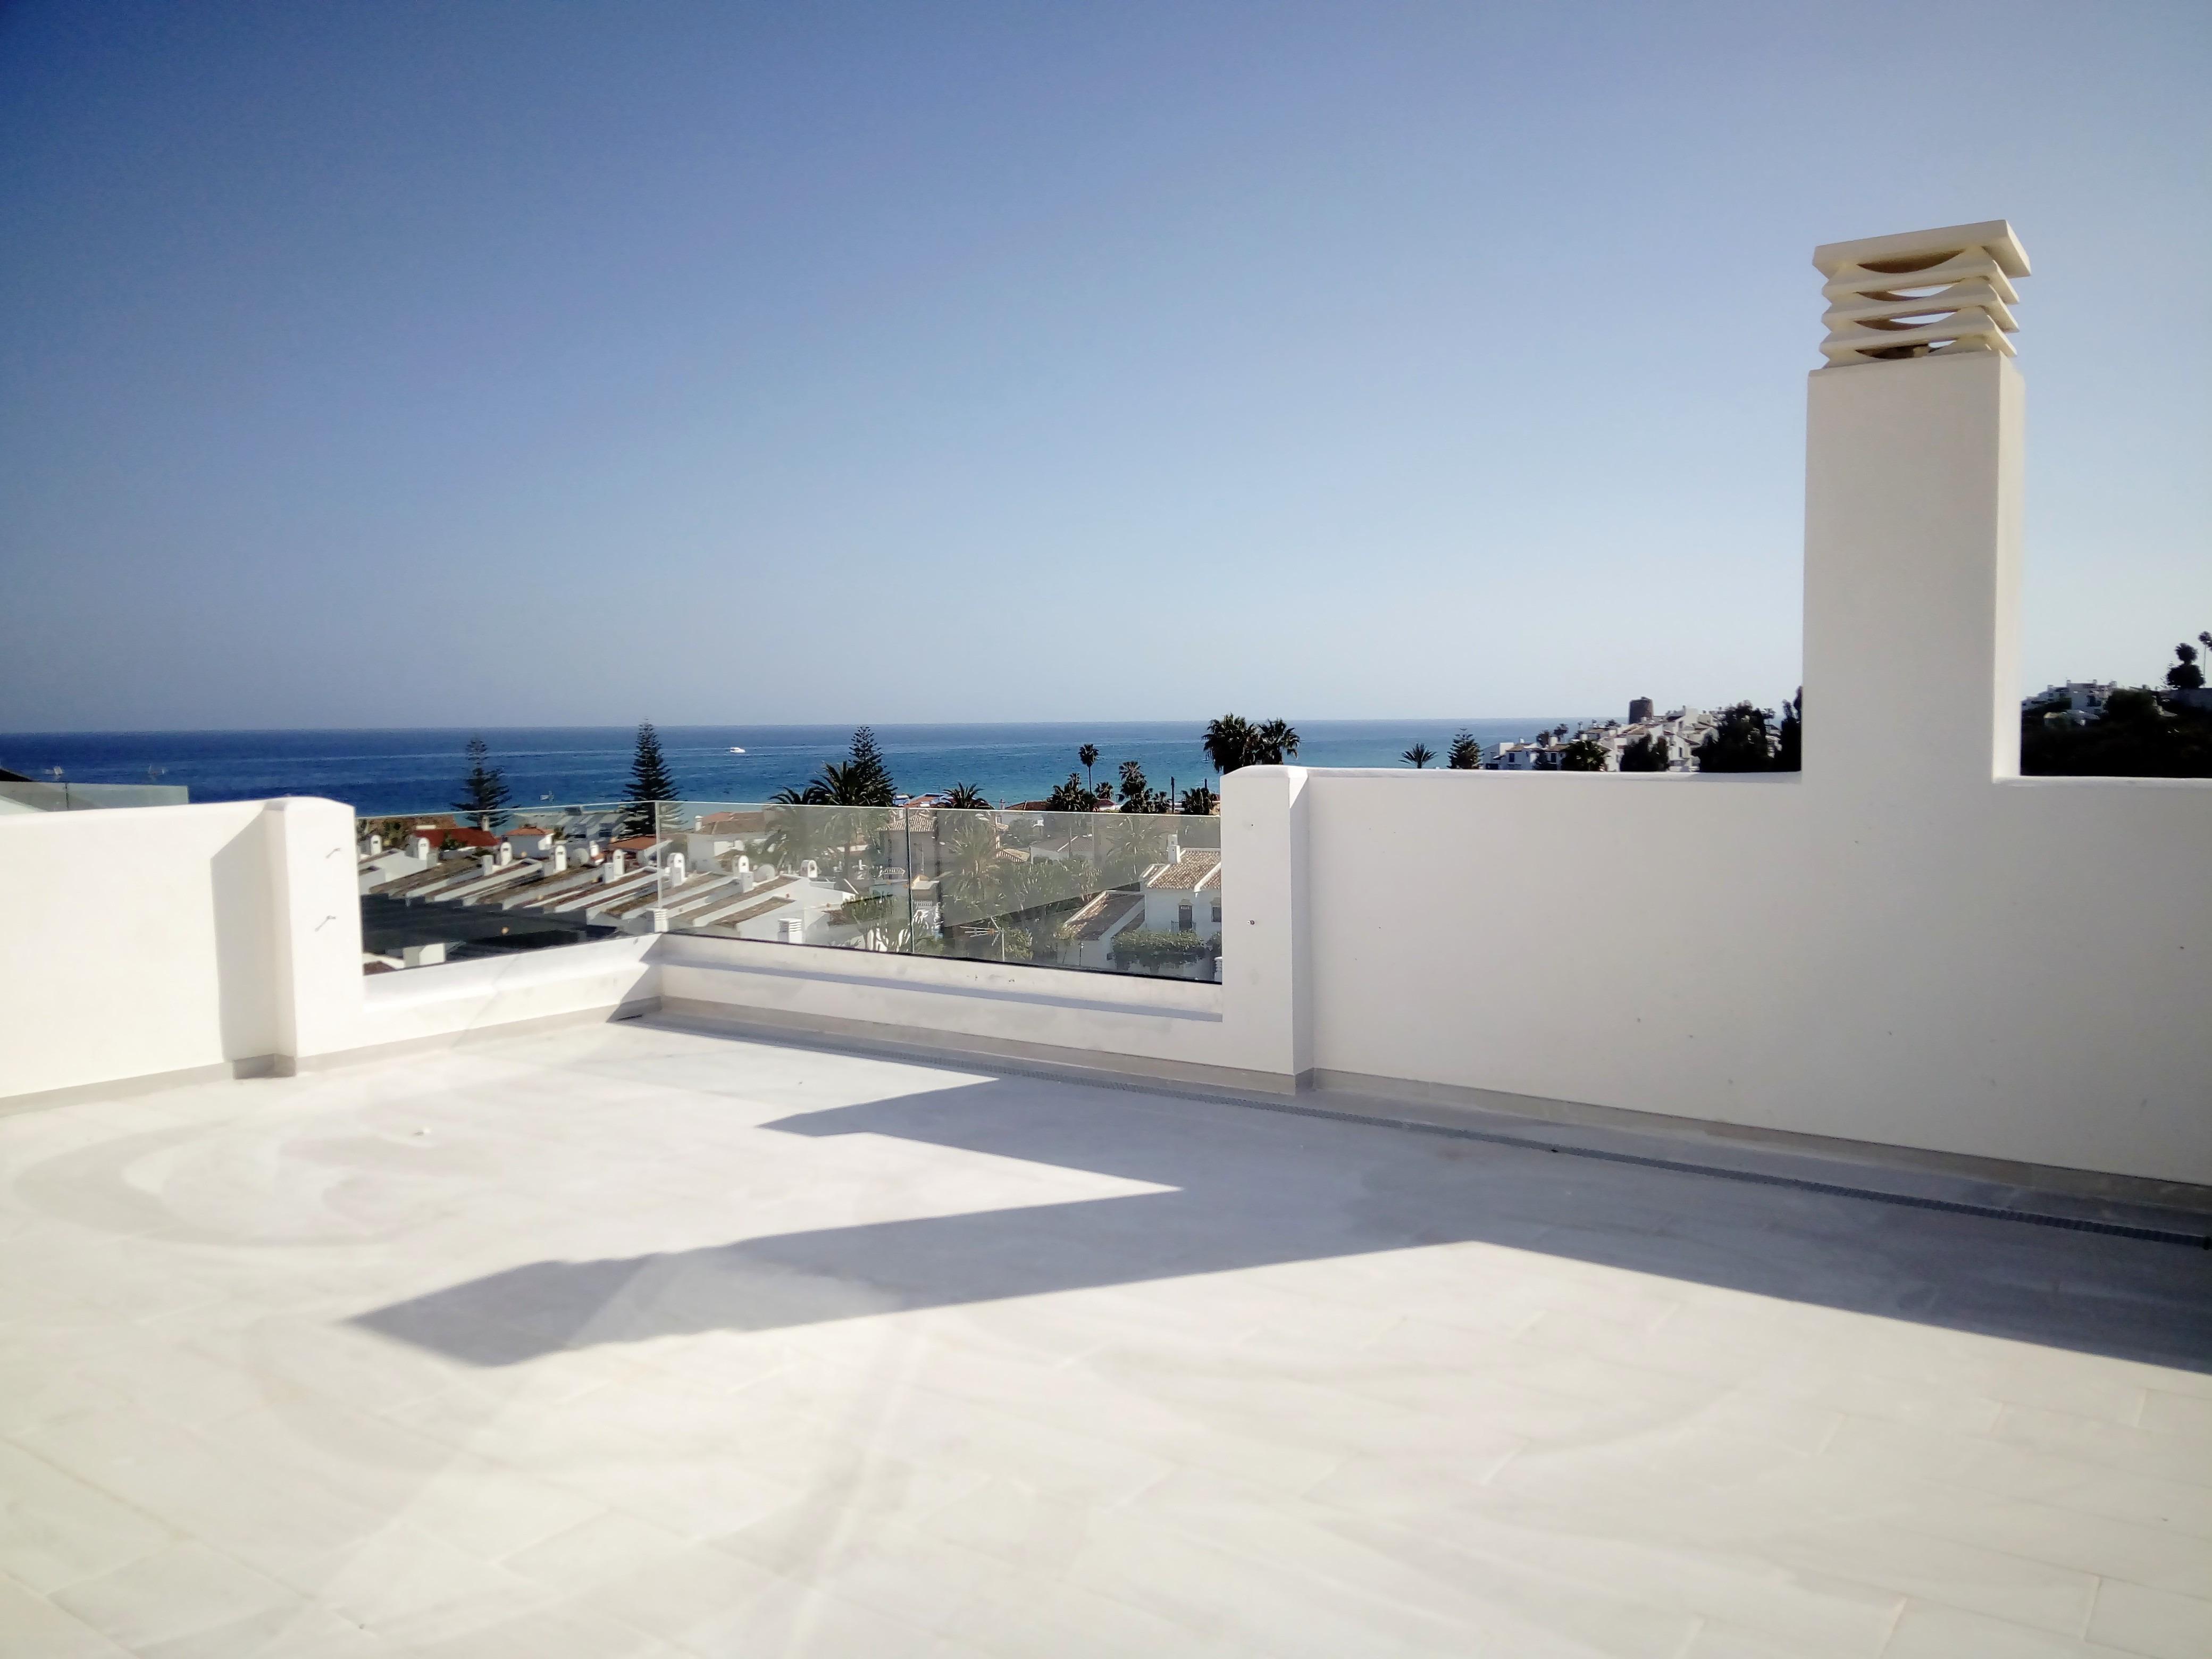 Cordoba penthouse bloc 3 B top floor terrace out